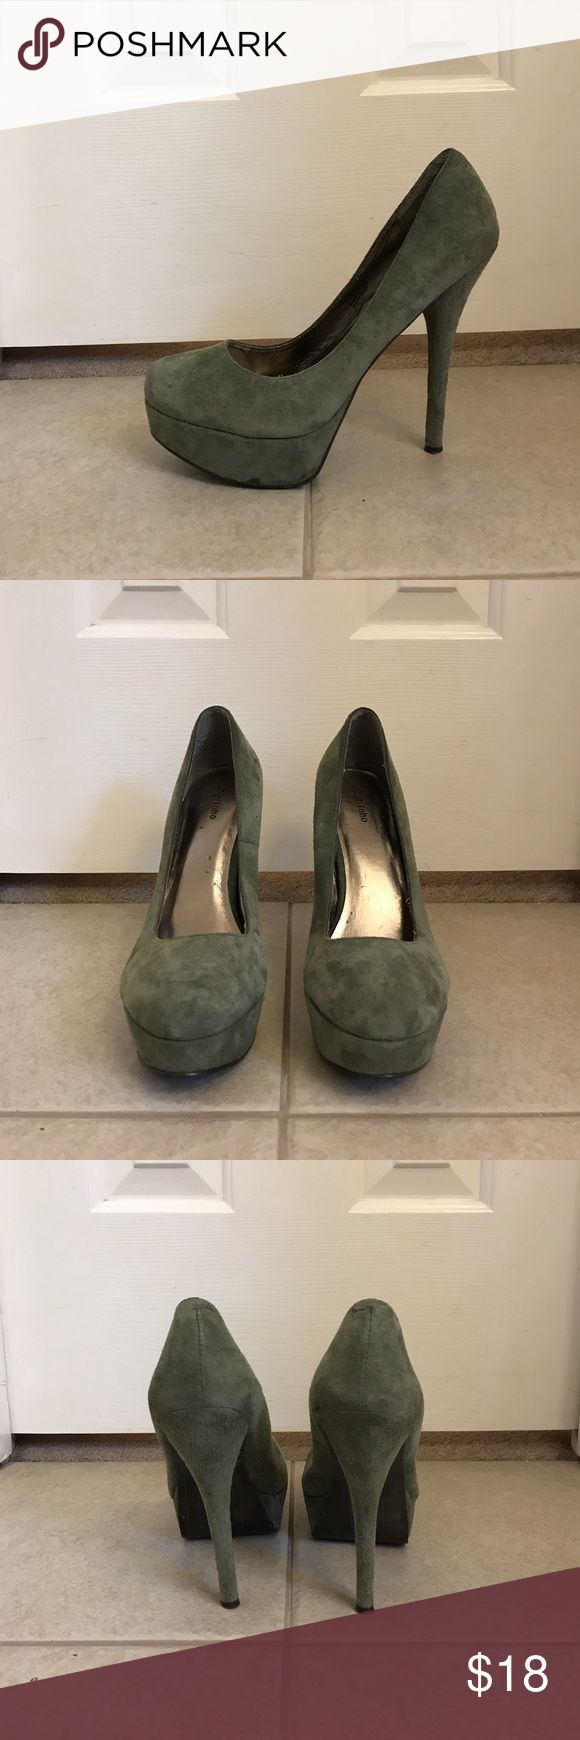 Womens olive green suede platform pump Womens olive green suede platform pump. Zigi Soho Shoes Heels